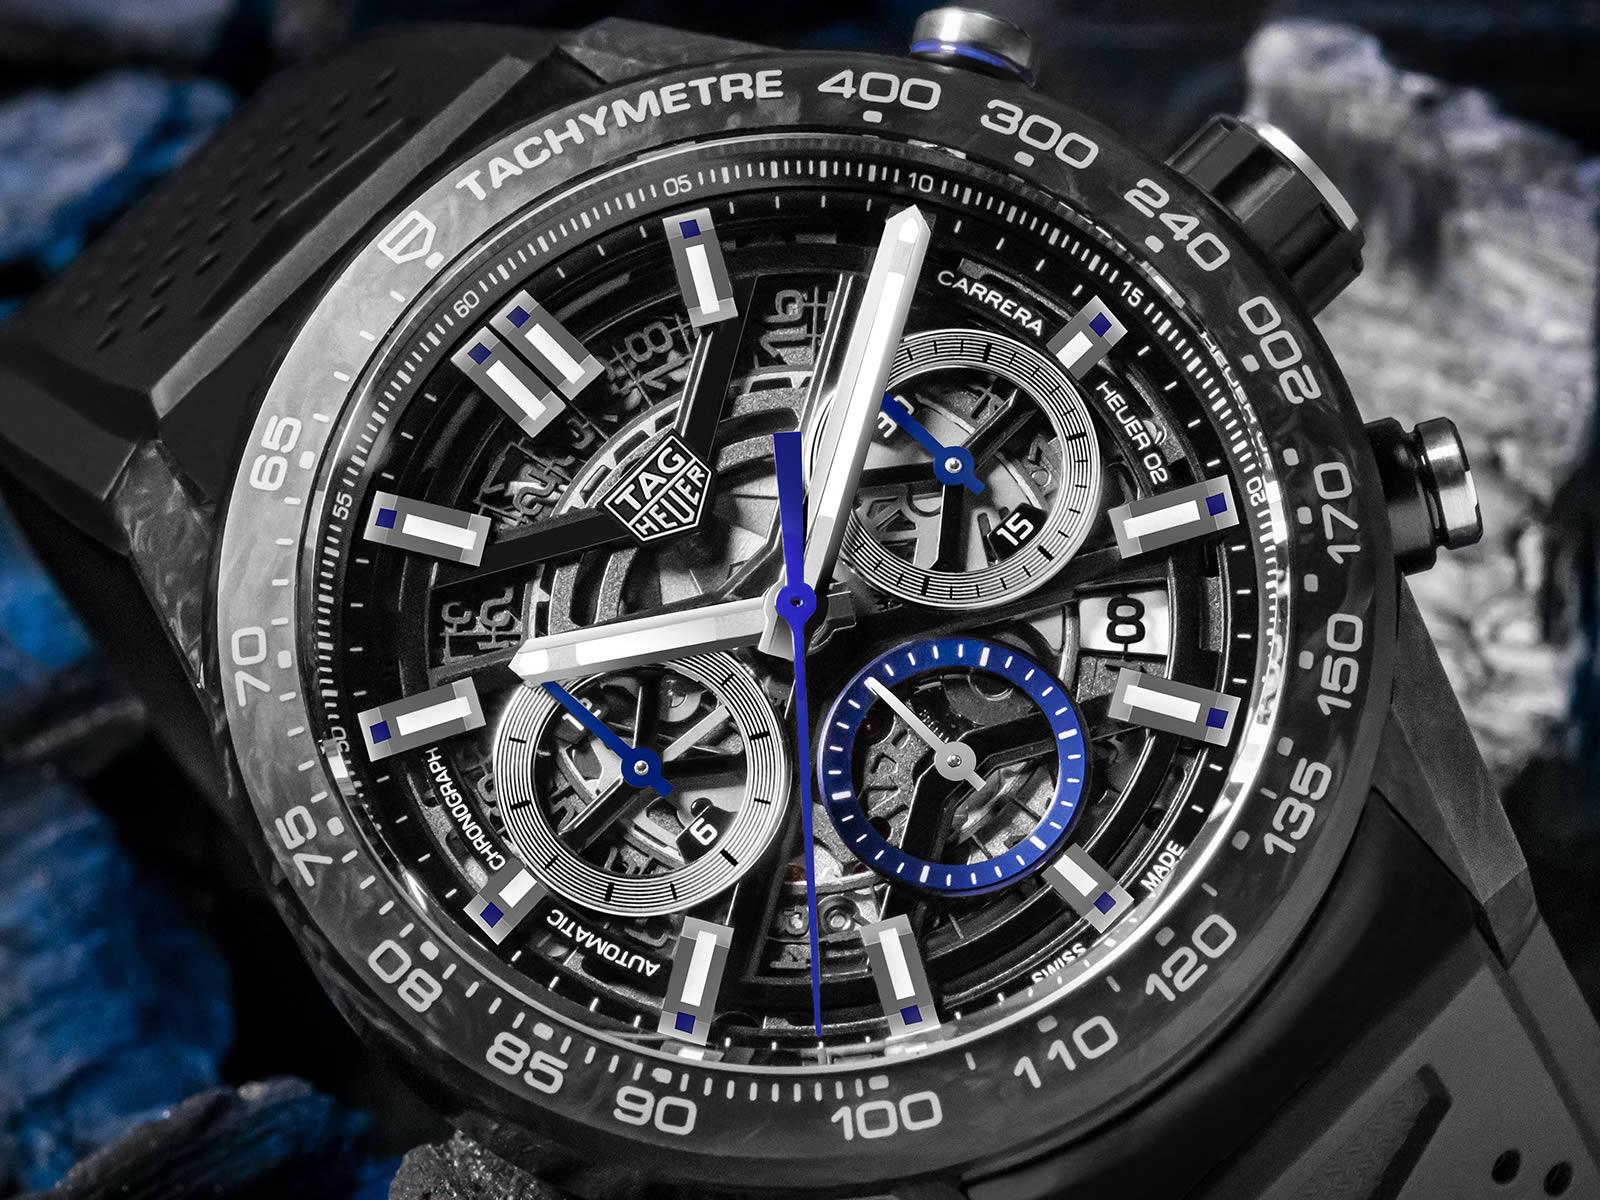 cbg2017-ft6143-tag-heuer-carrera-calibre-heuer02-automatic-chronograph-43-mm-2-.jpg